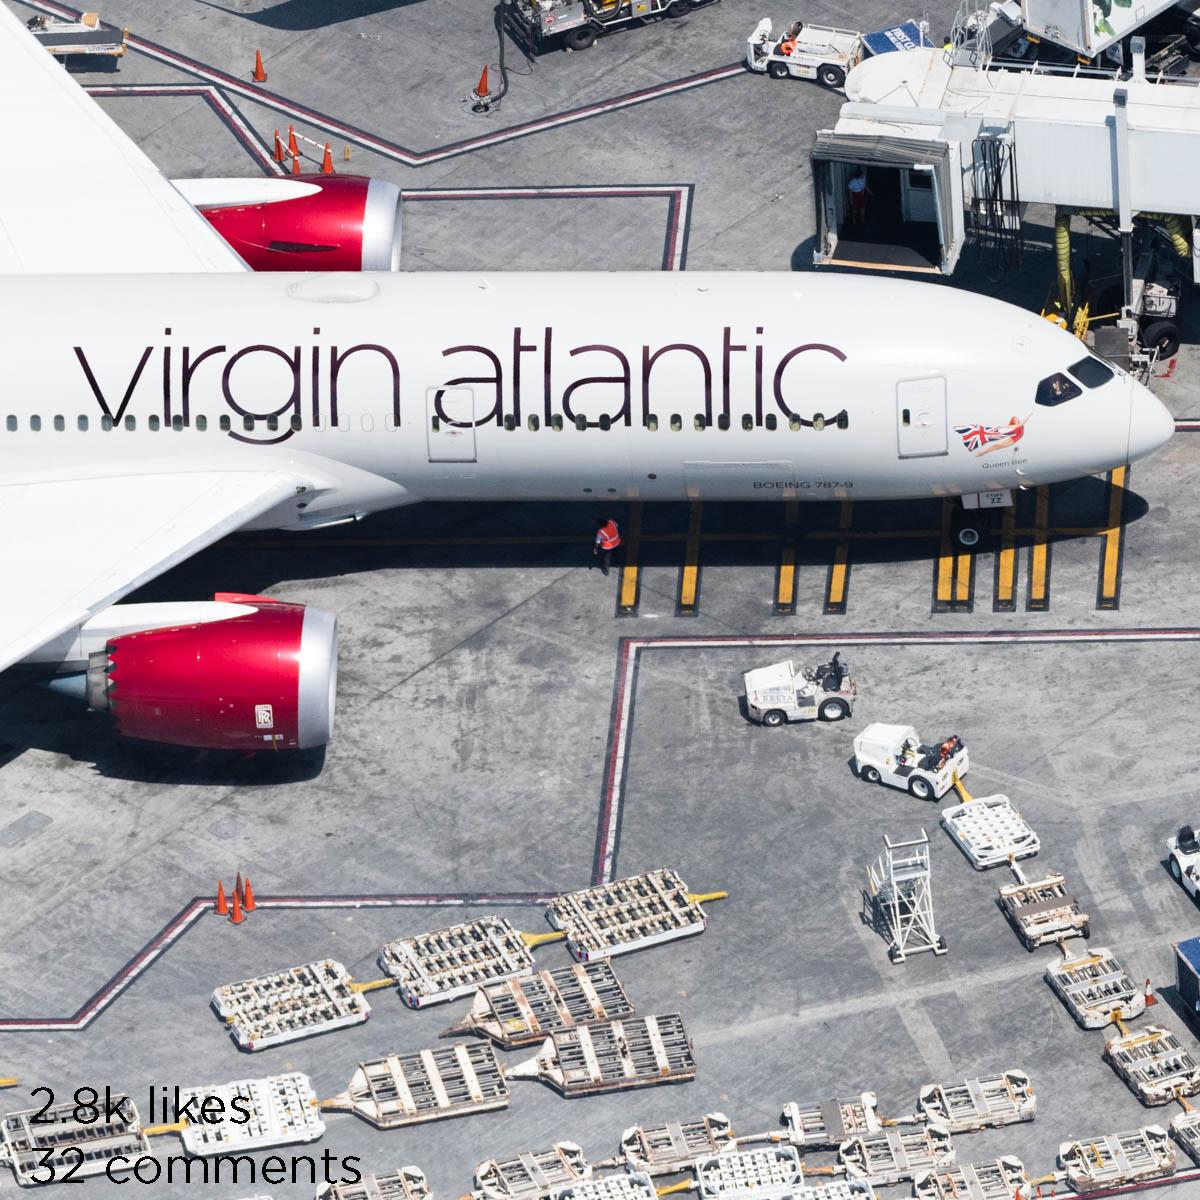 virgin atlantic 787 into gate (1 of 1).jpg